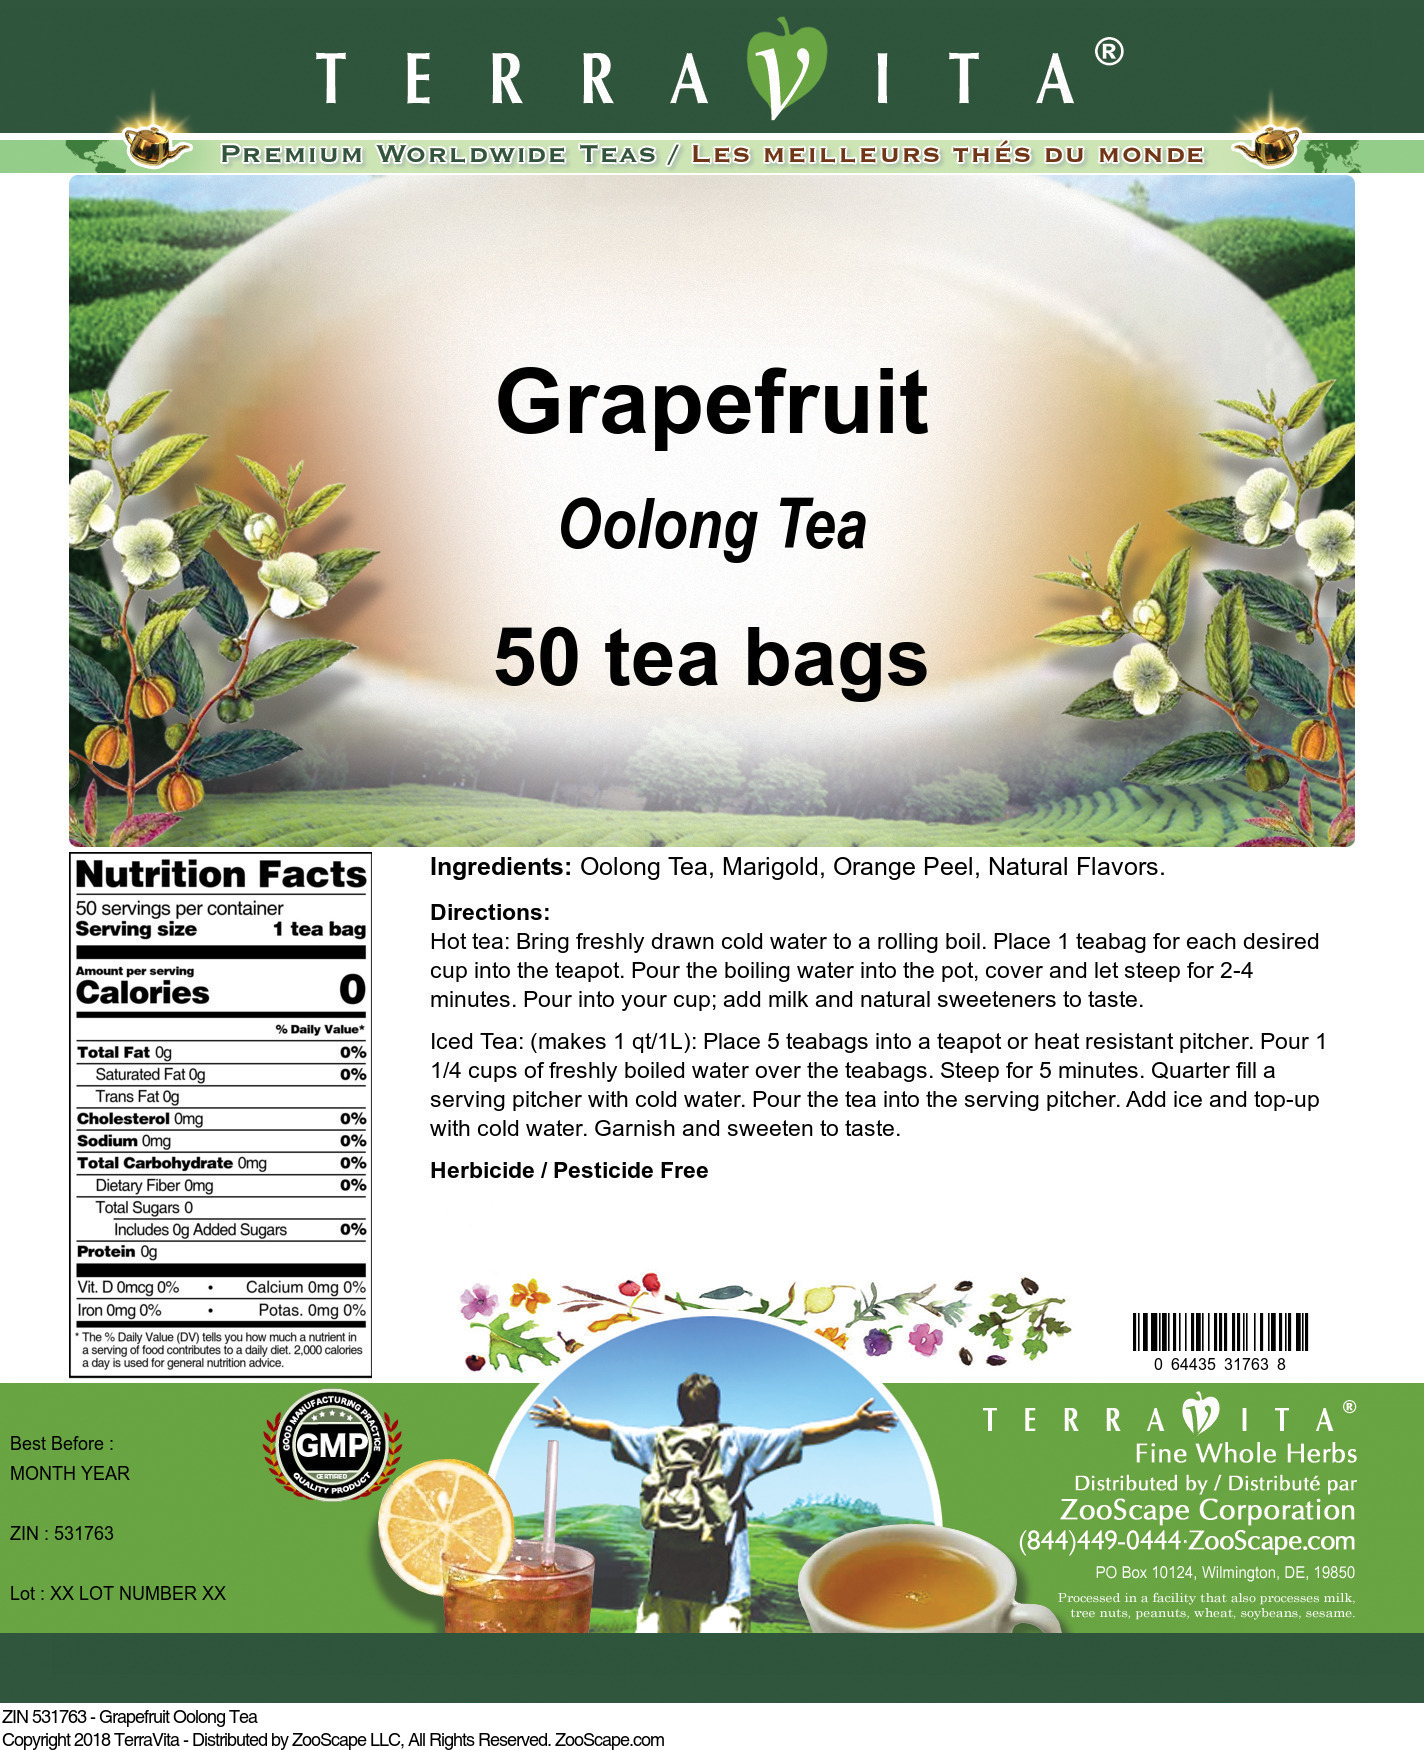 Grapefruit Oolong Tea